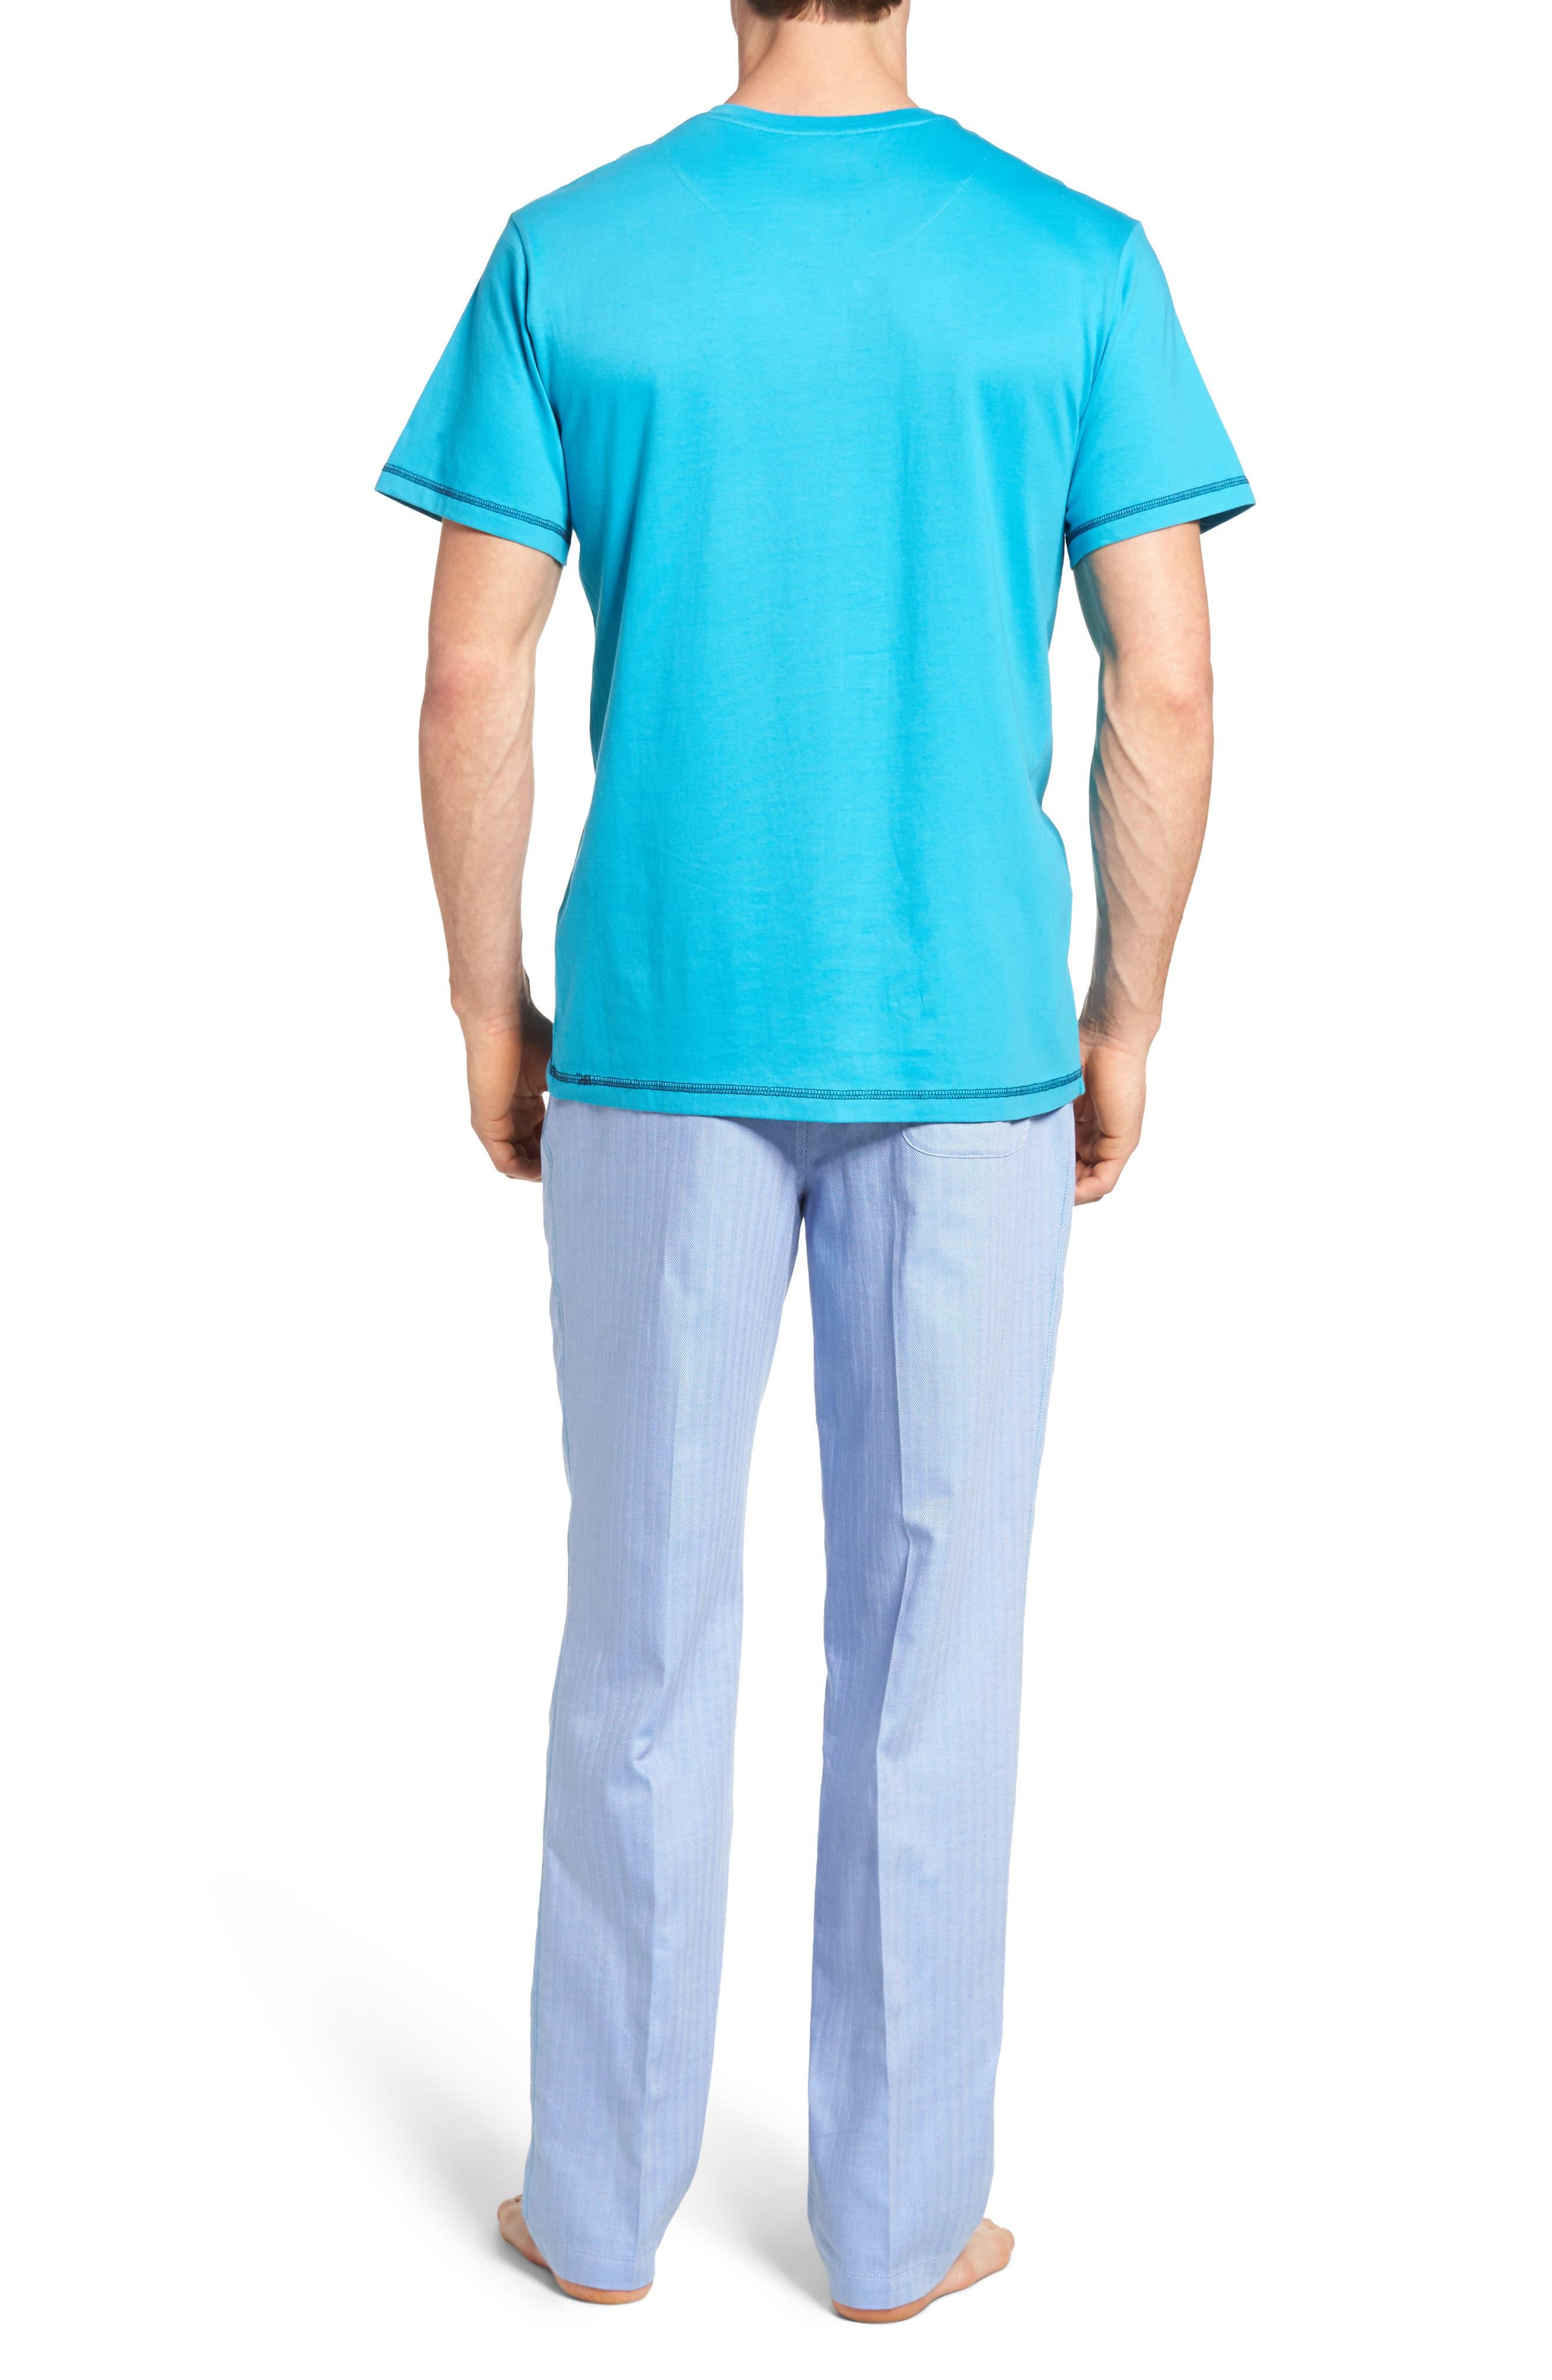 Fusion Pajama Set,                             Alternate thumbnail 2, color,                             439